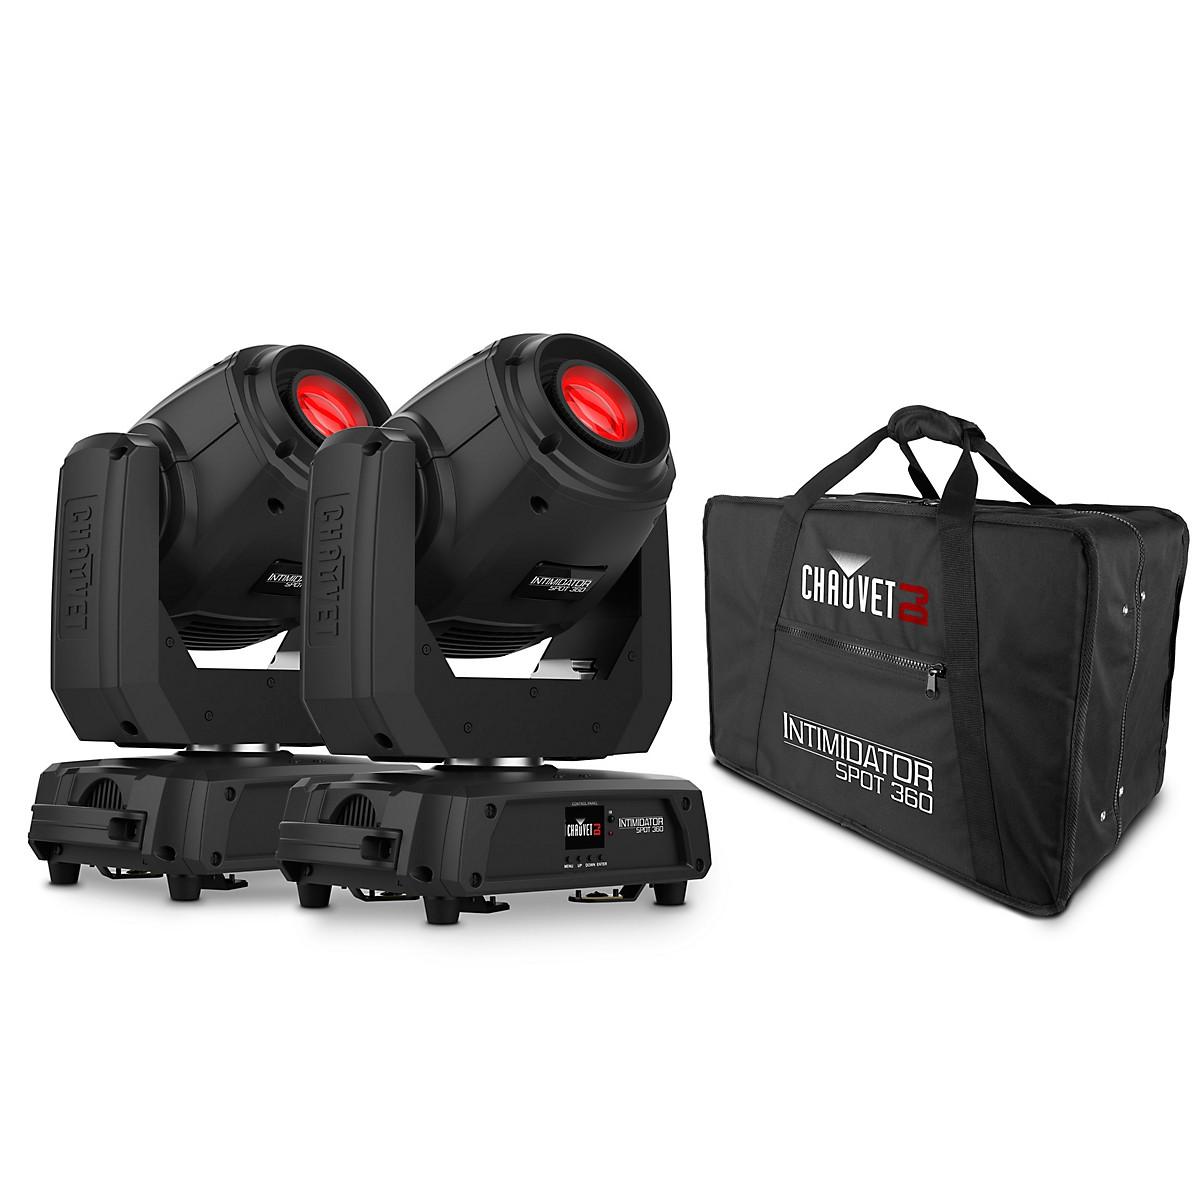 CHAUVET DJ Intimidator Spot 360 LED Spotlight (Pair) with CHS-360 Case